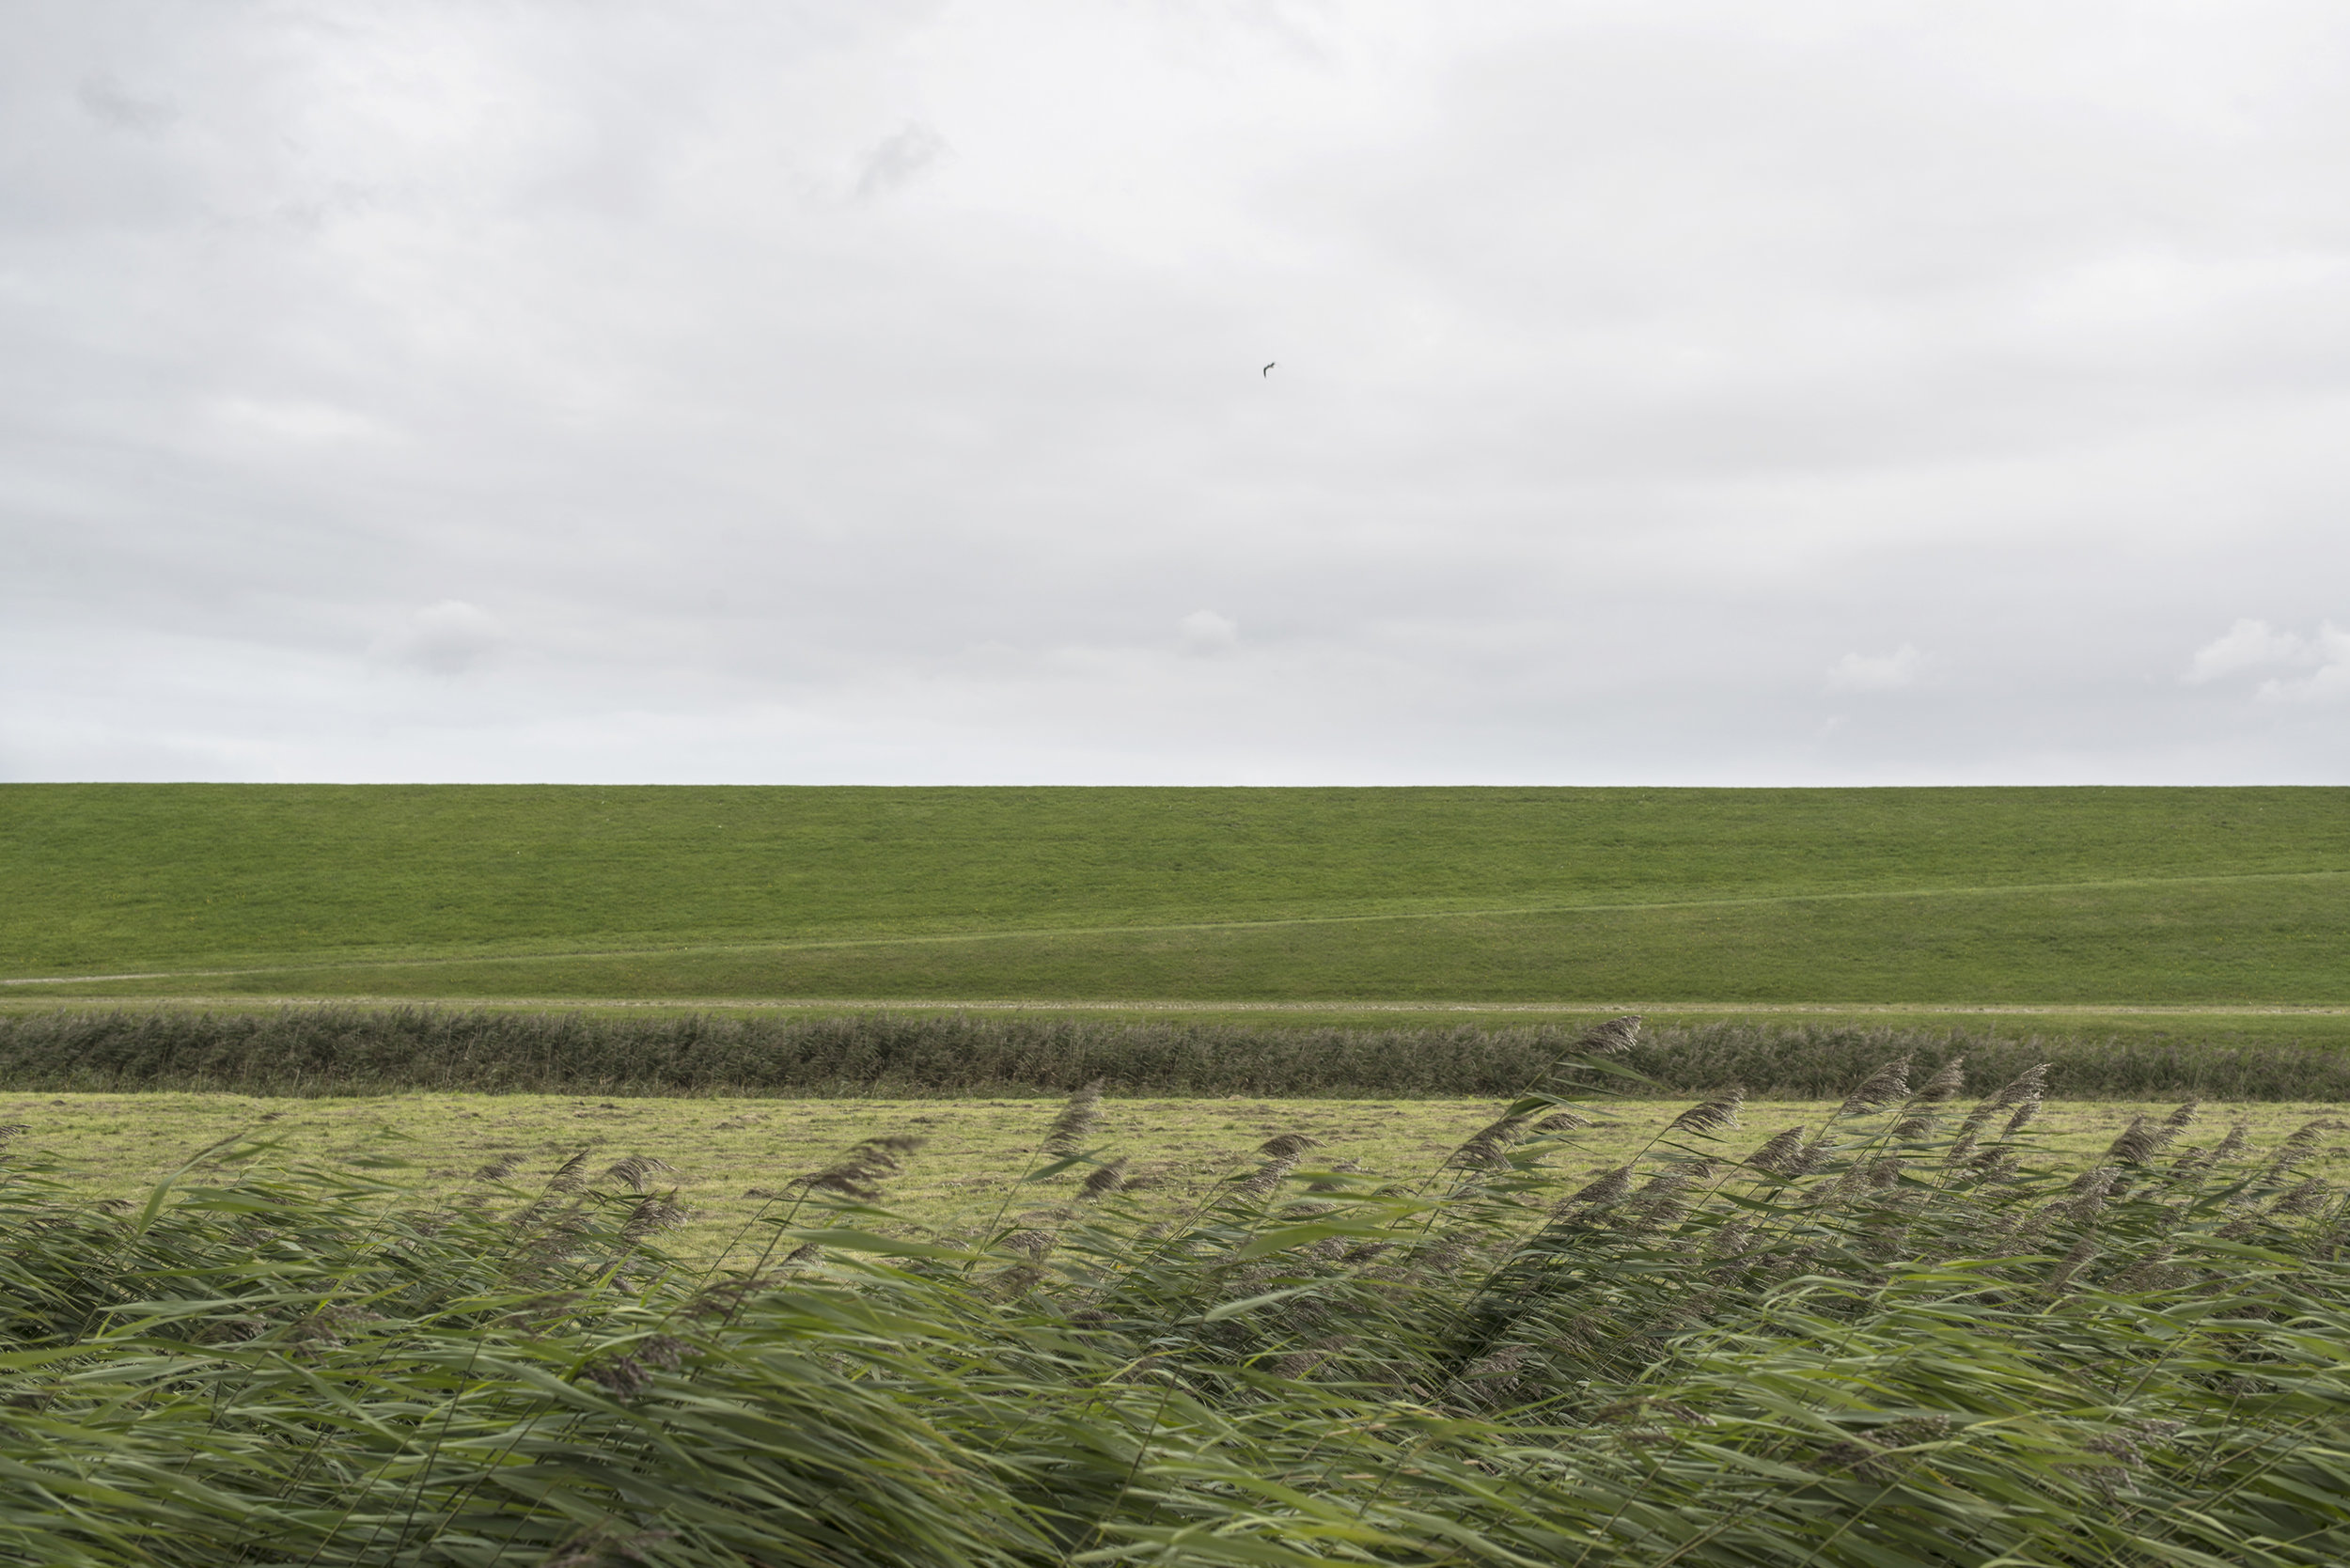 ©-Yorit-Kluitman-Gemeente-Dongeradeel.jpg